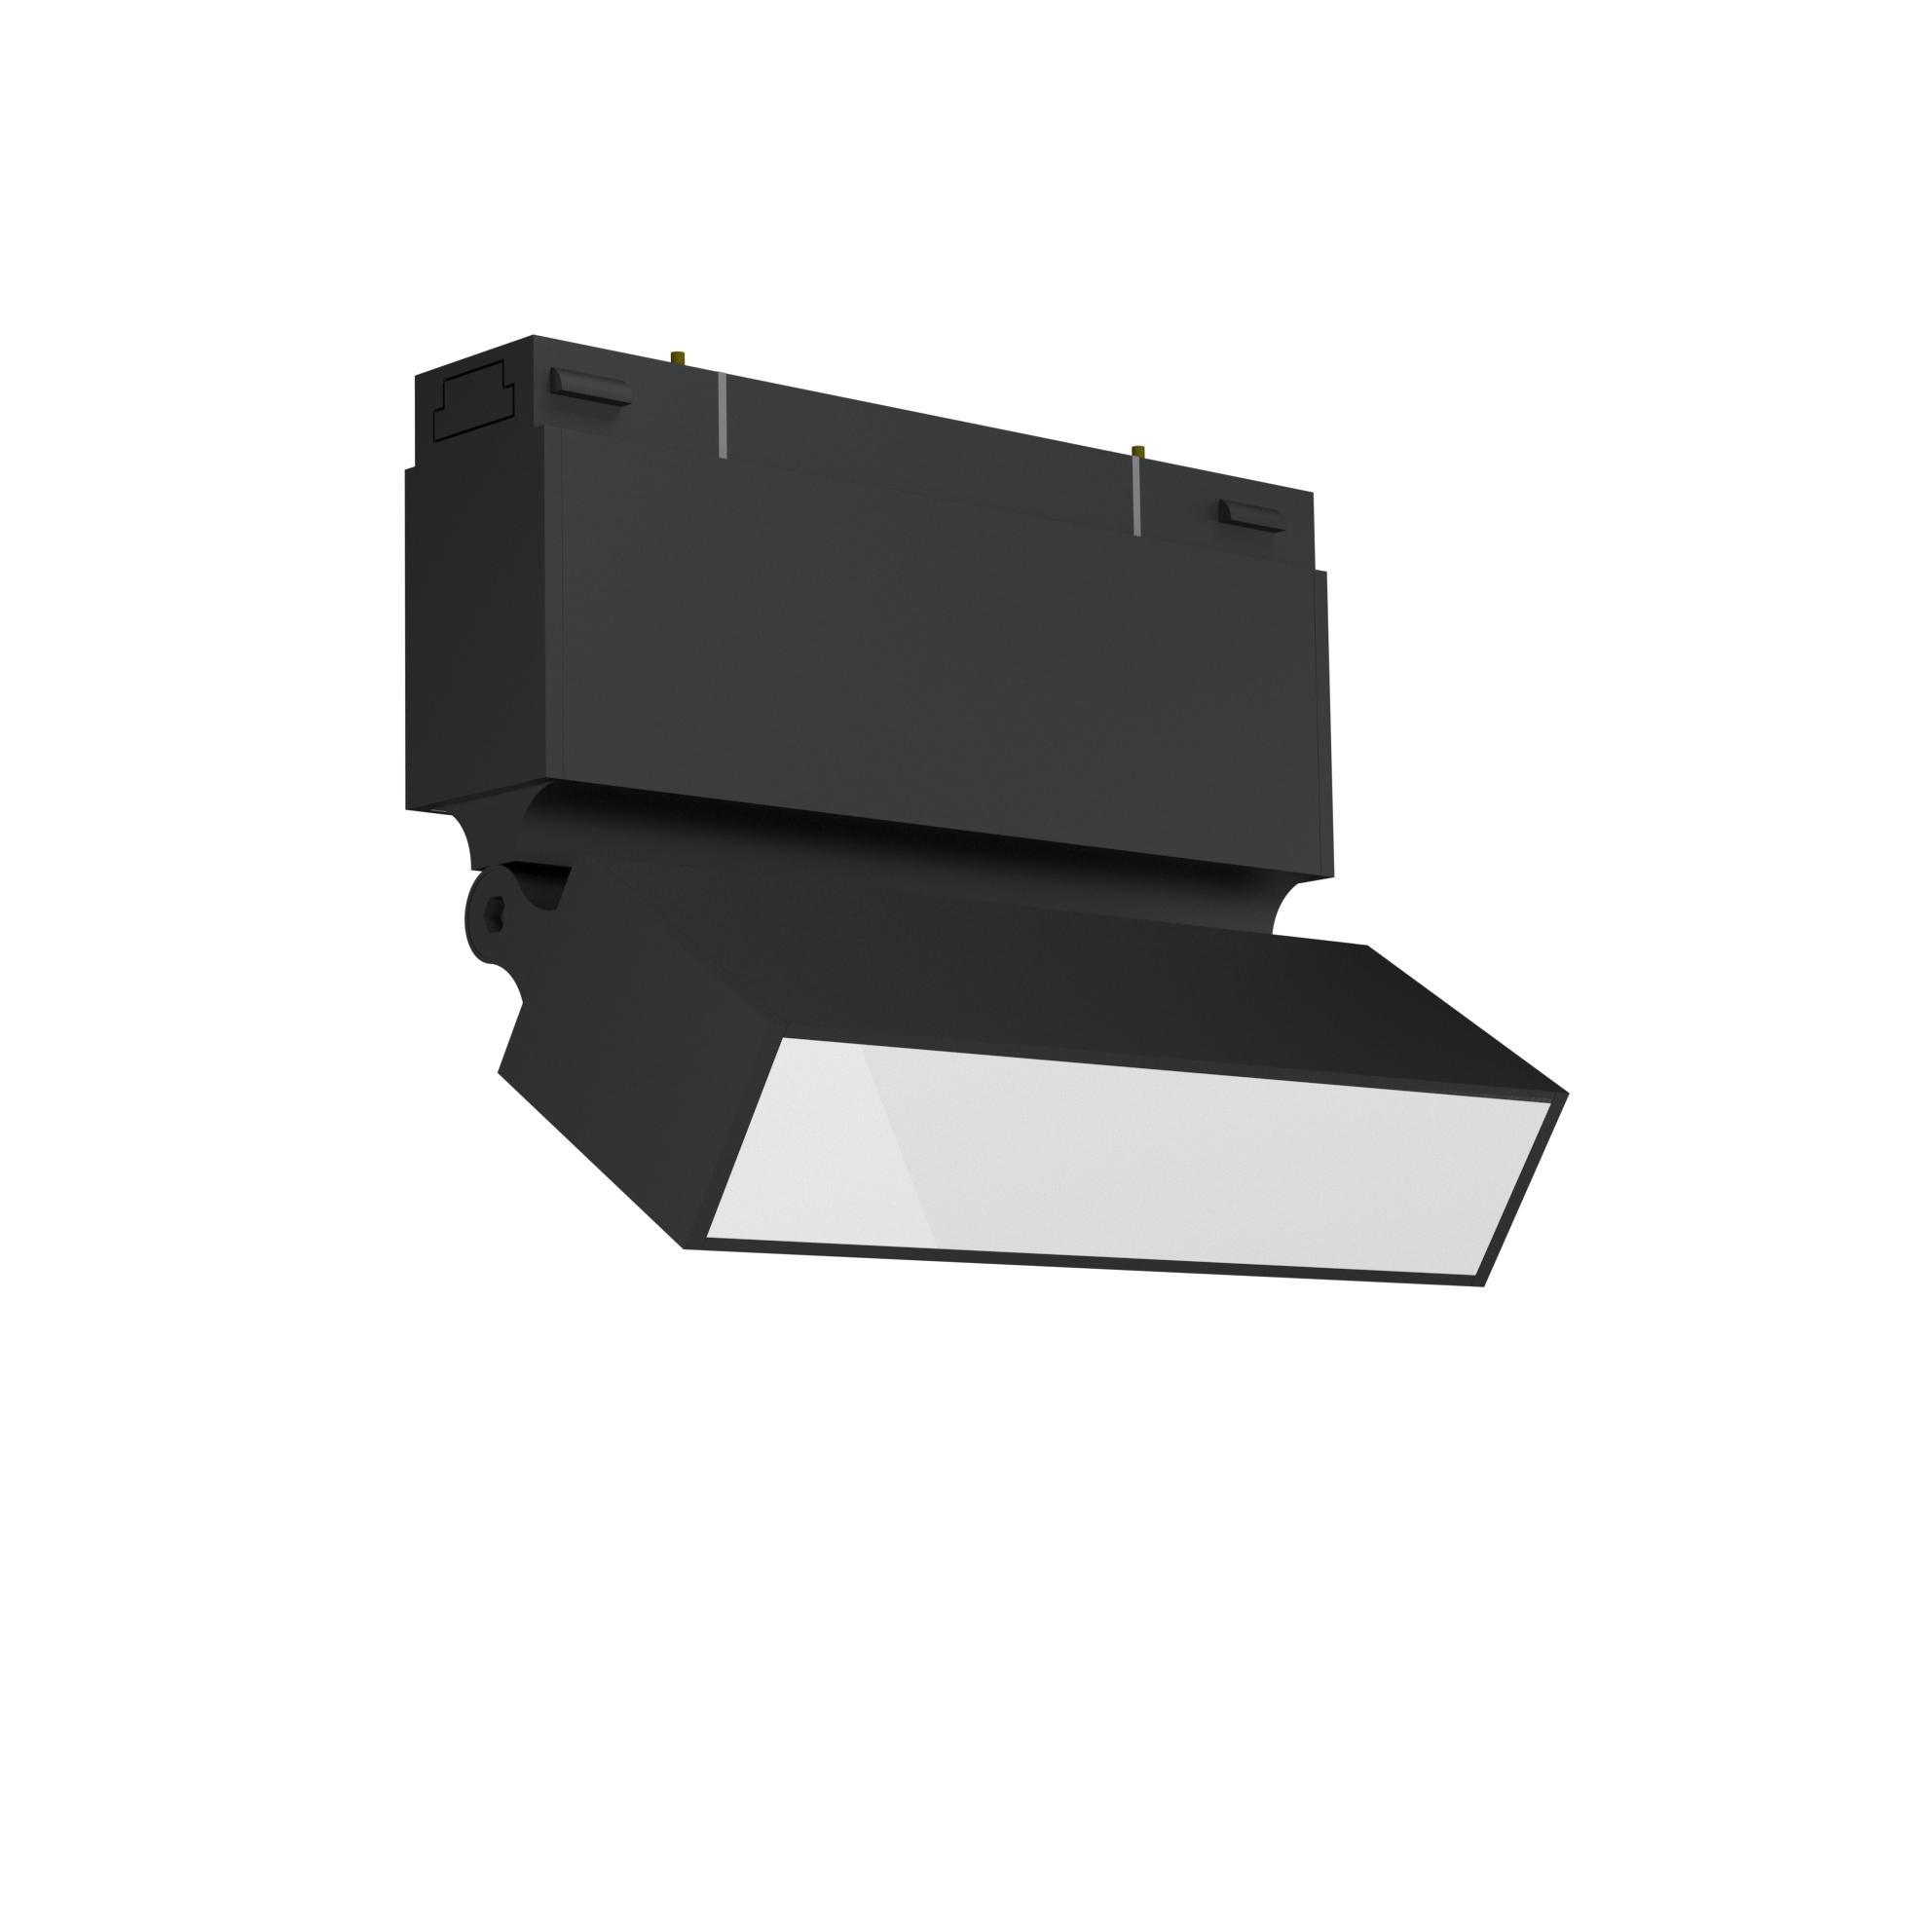 PNY-Led Spot Light Manufacturer, Led Light Fixtures | Pny